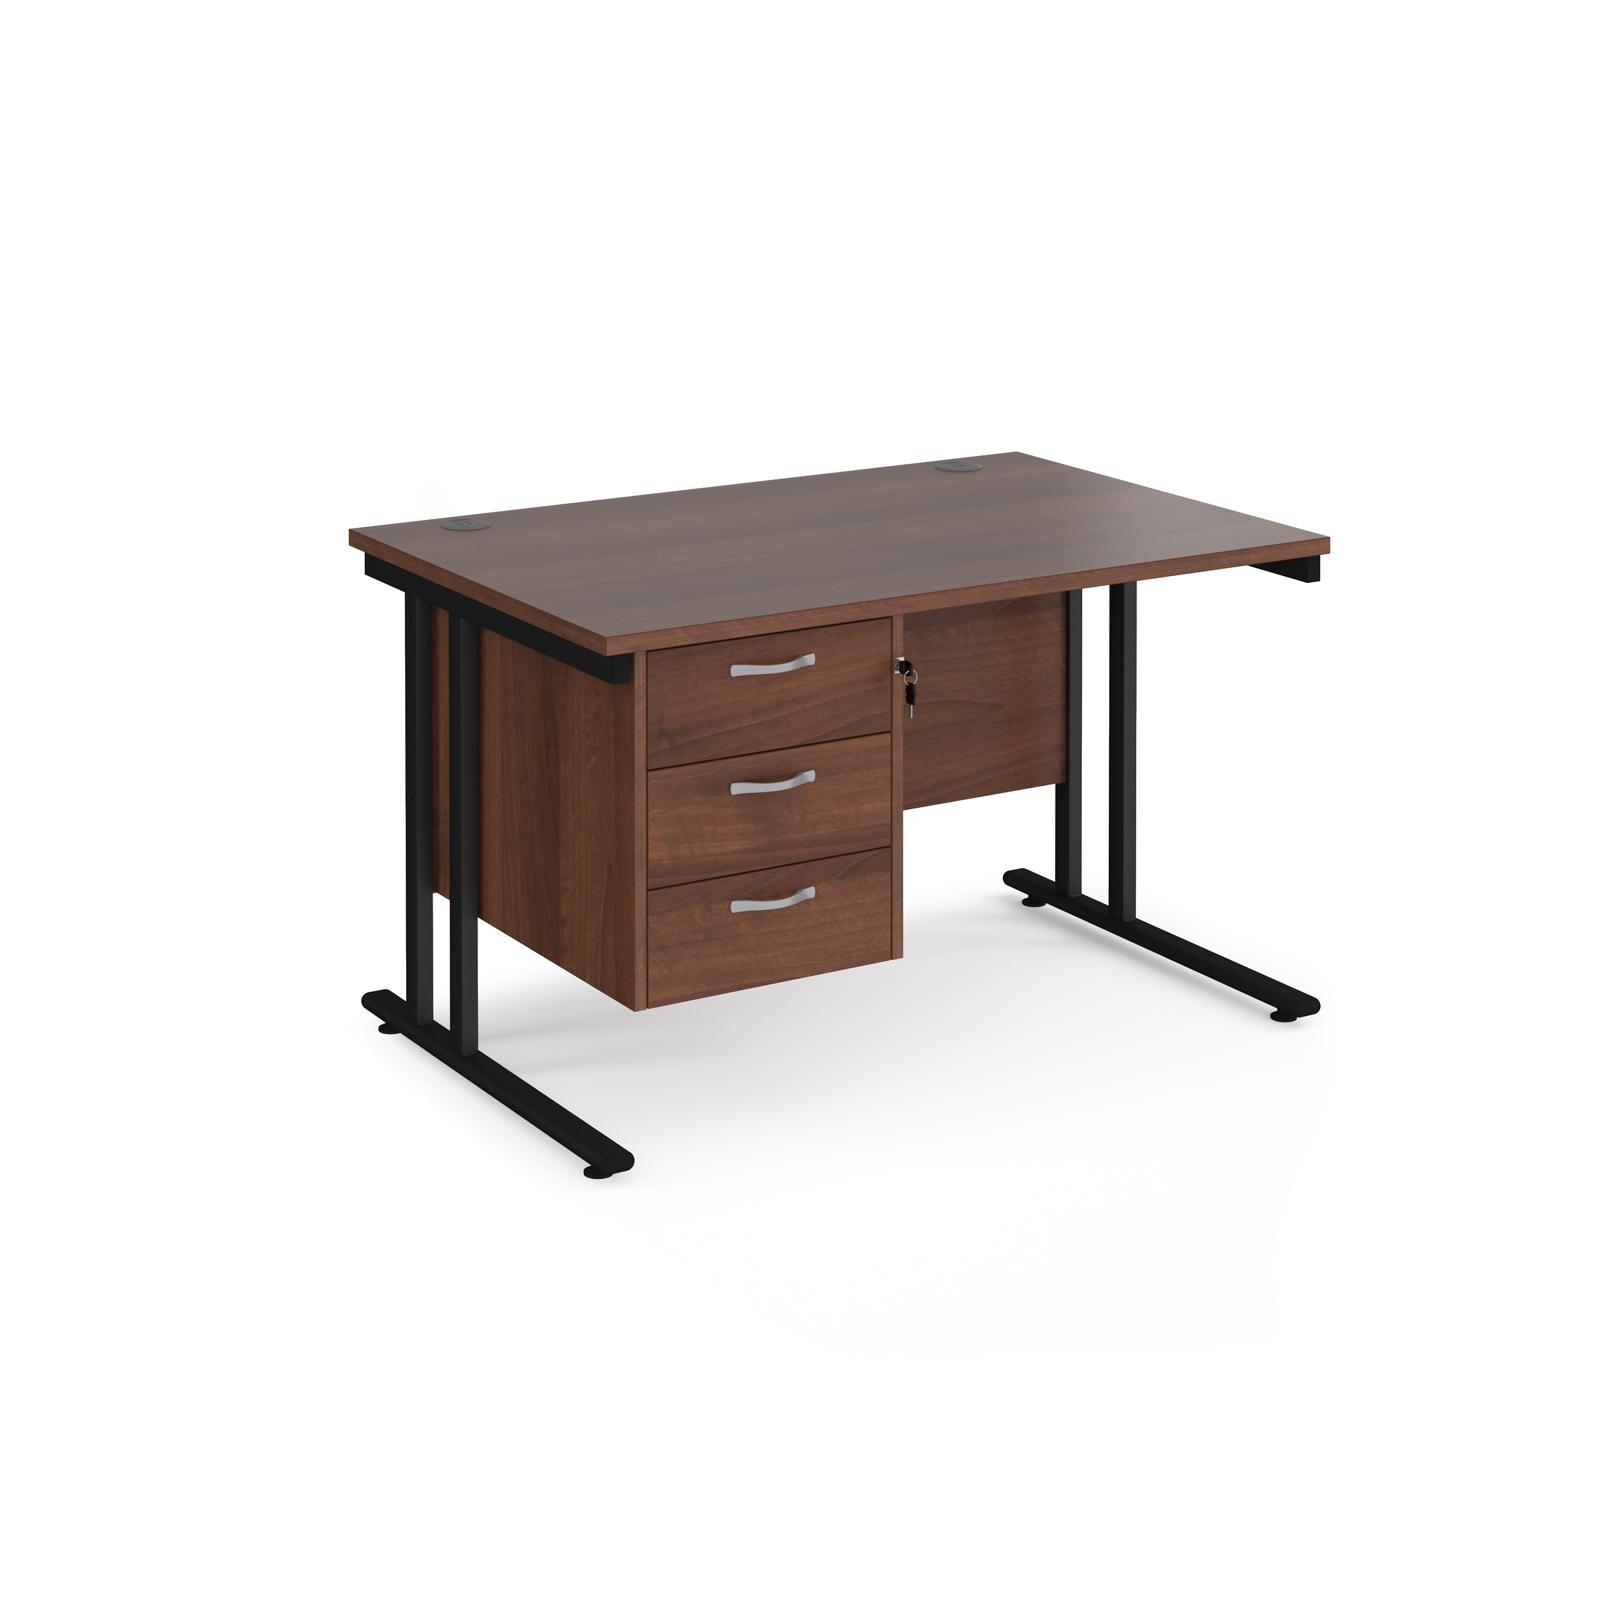 Rectangular Desks Maestro 25 straight desk 1200mm x 800mm with 3 drawer pedestal - black cantilever leg frame, walnut top